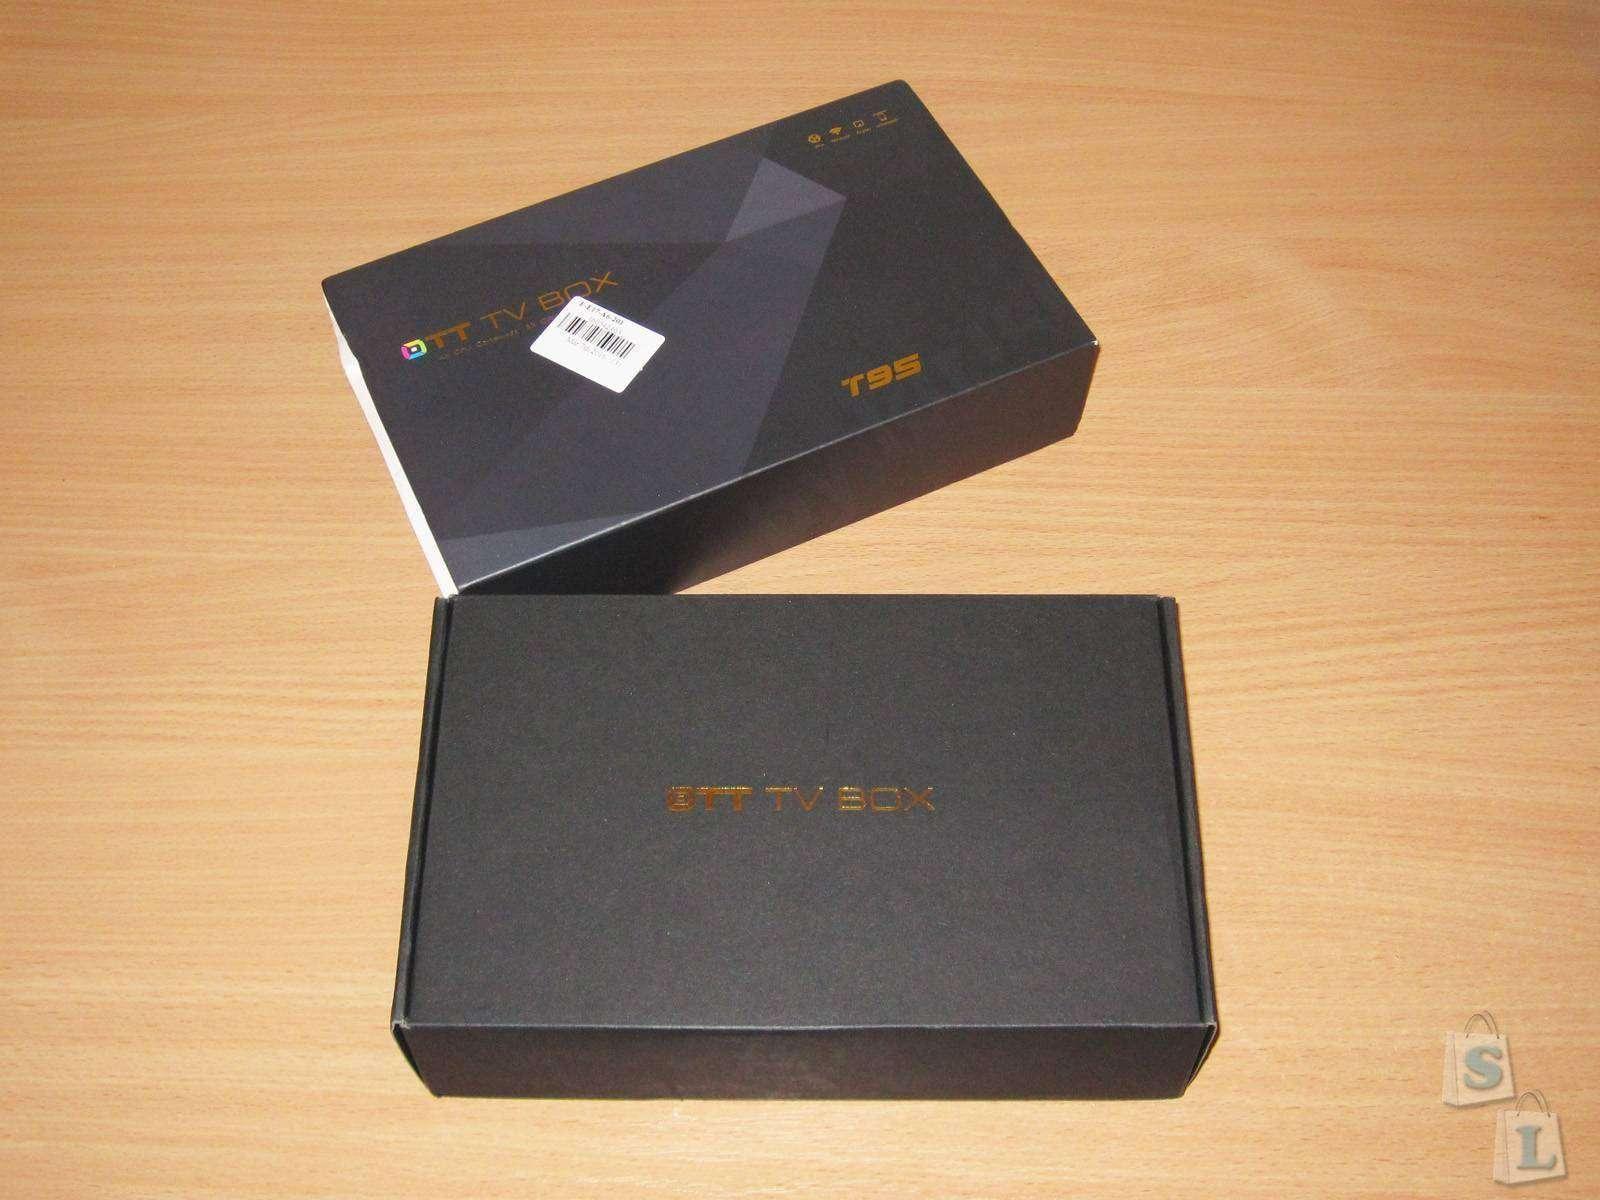 GearBest: Sunvell T95, симпатичный ТВ бокс на базе Amlogic S905